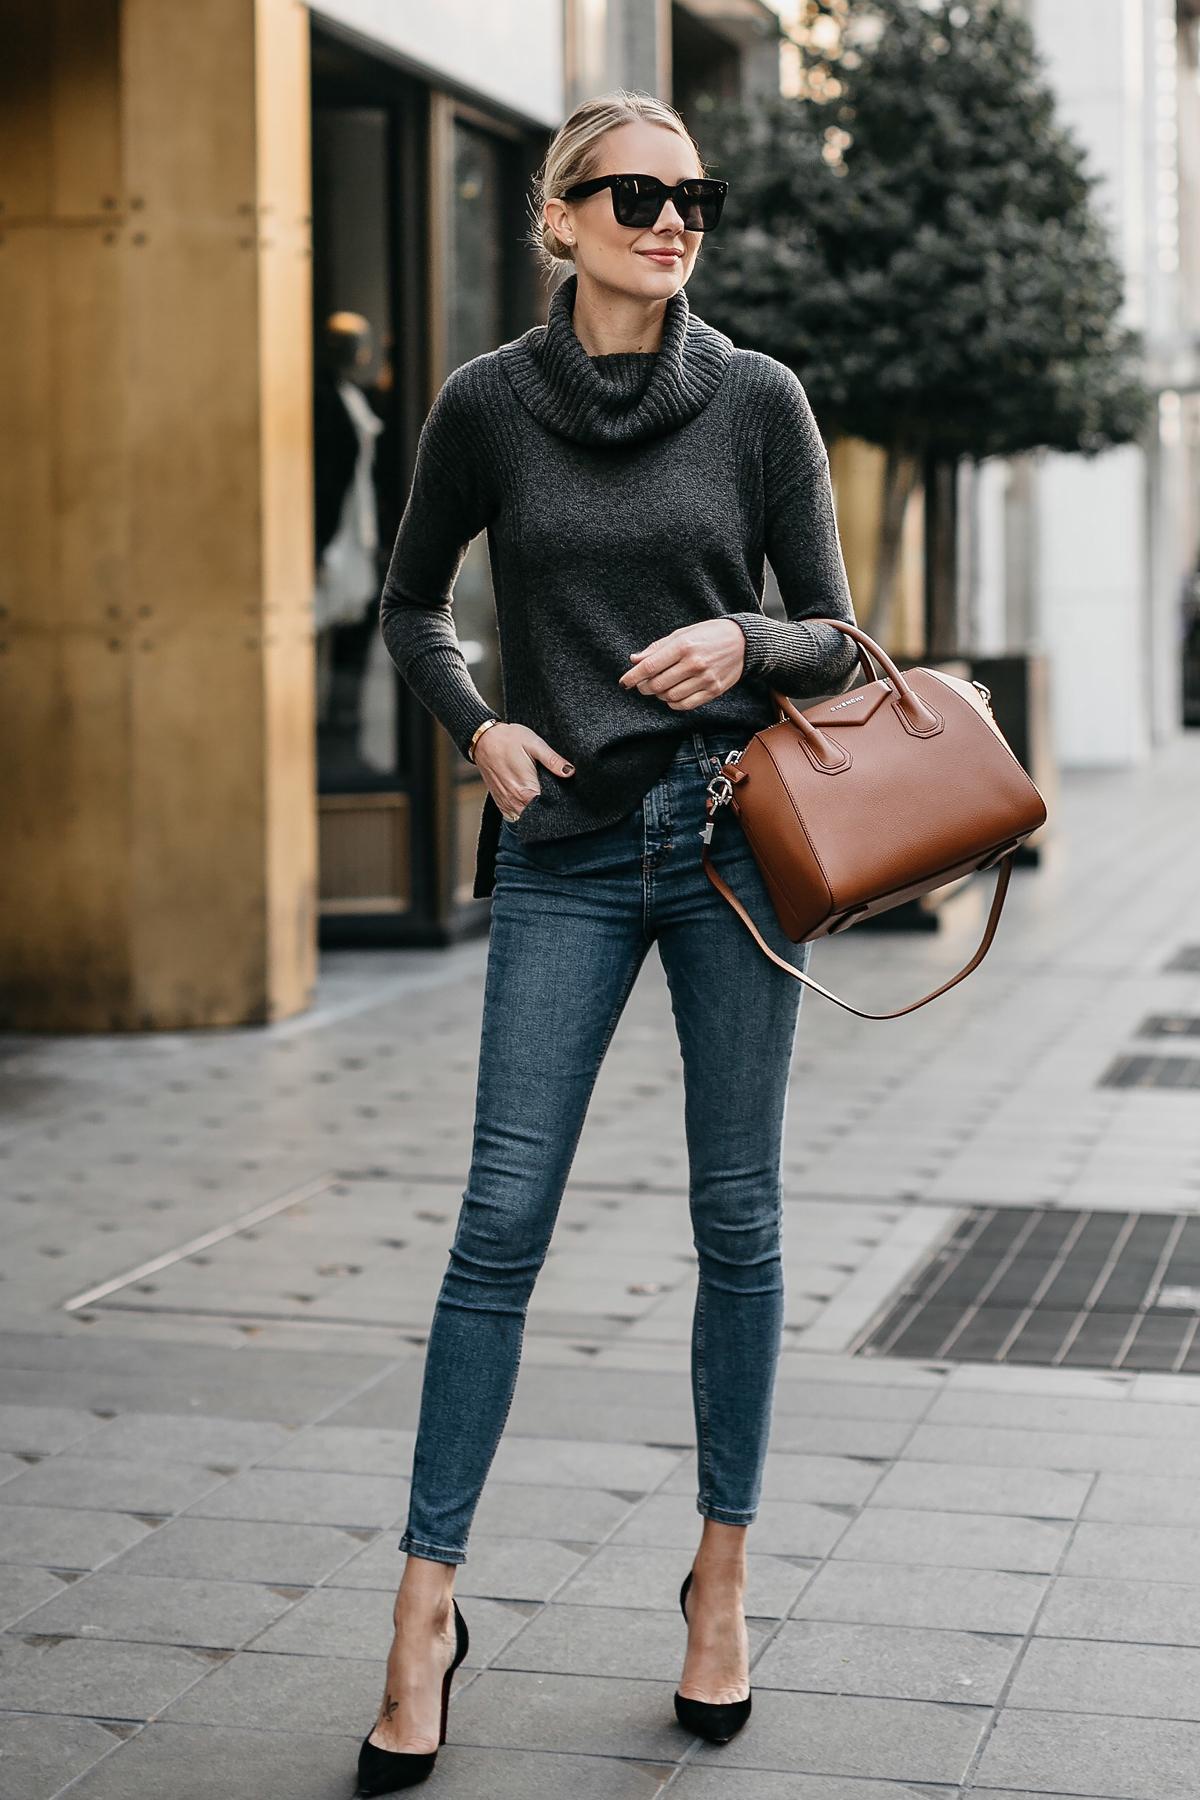 Blonde Woman Wearing Grey Turtleneck Sweater Denim Skinny Jeans Givenchy Antigona Cognac Handbag Fashion Jackson Dallas Blogger Street Style